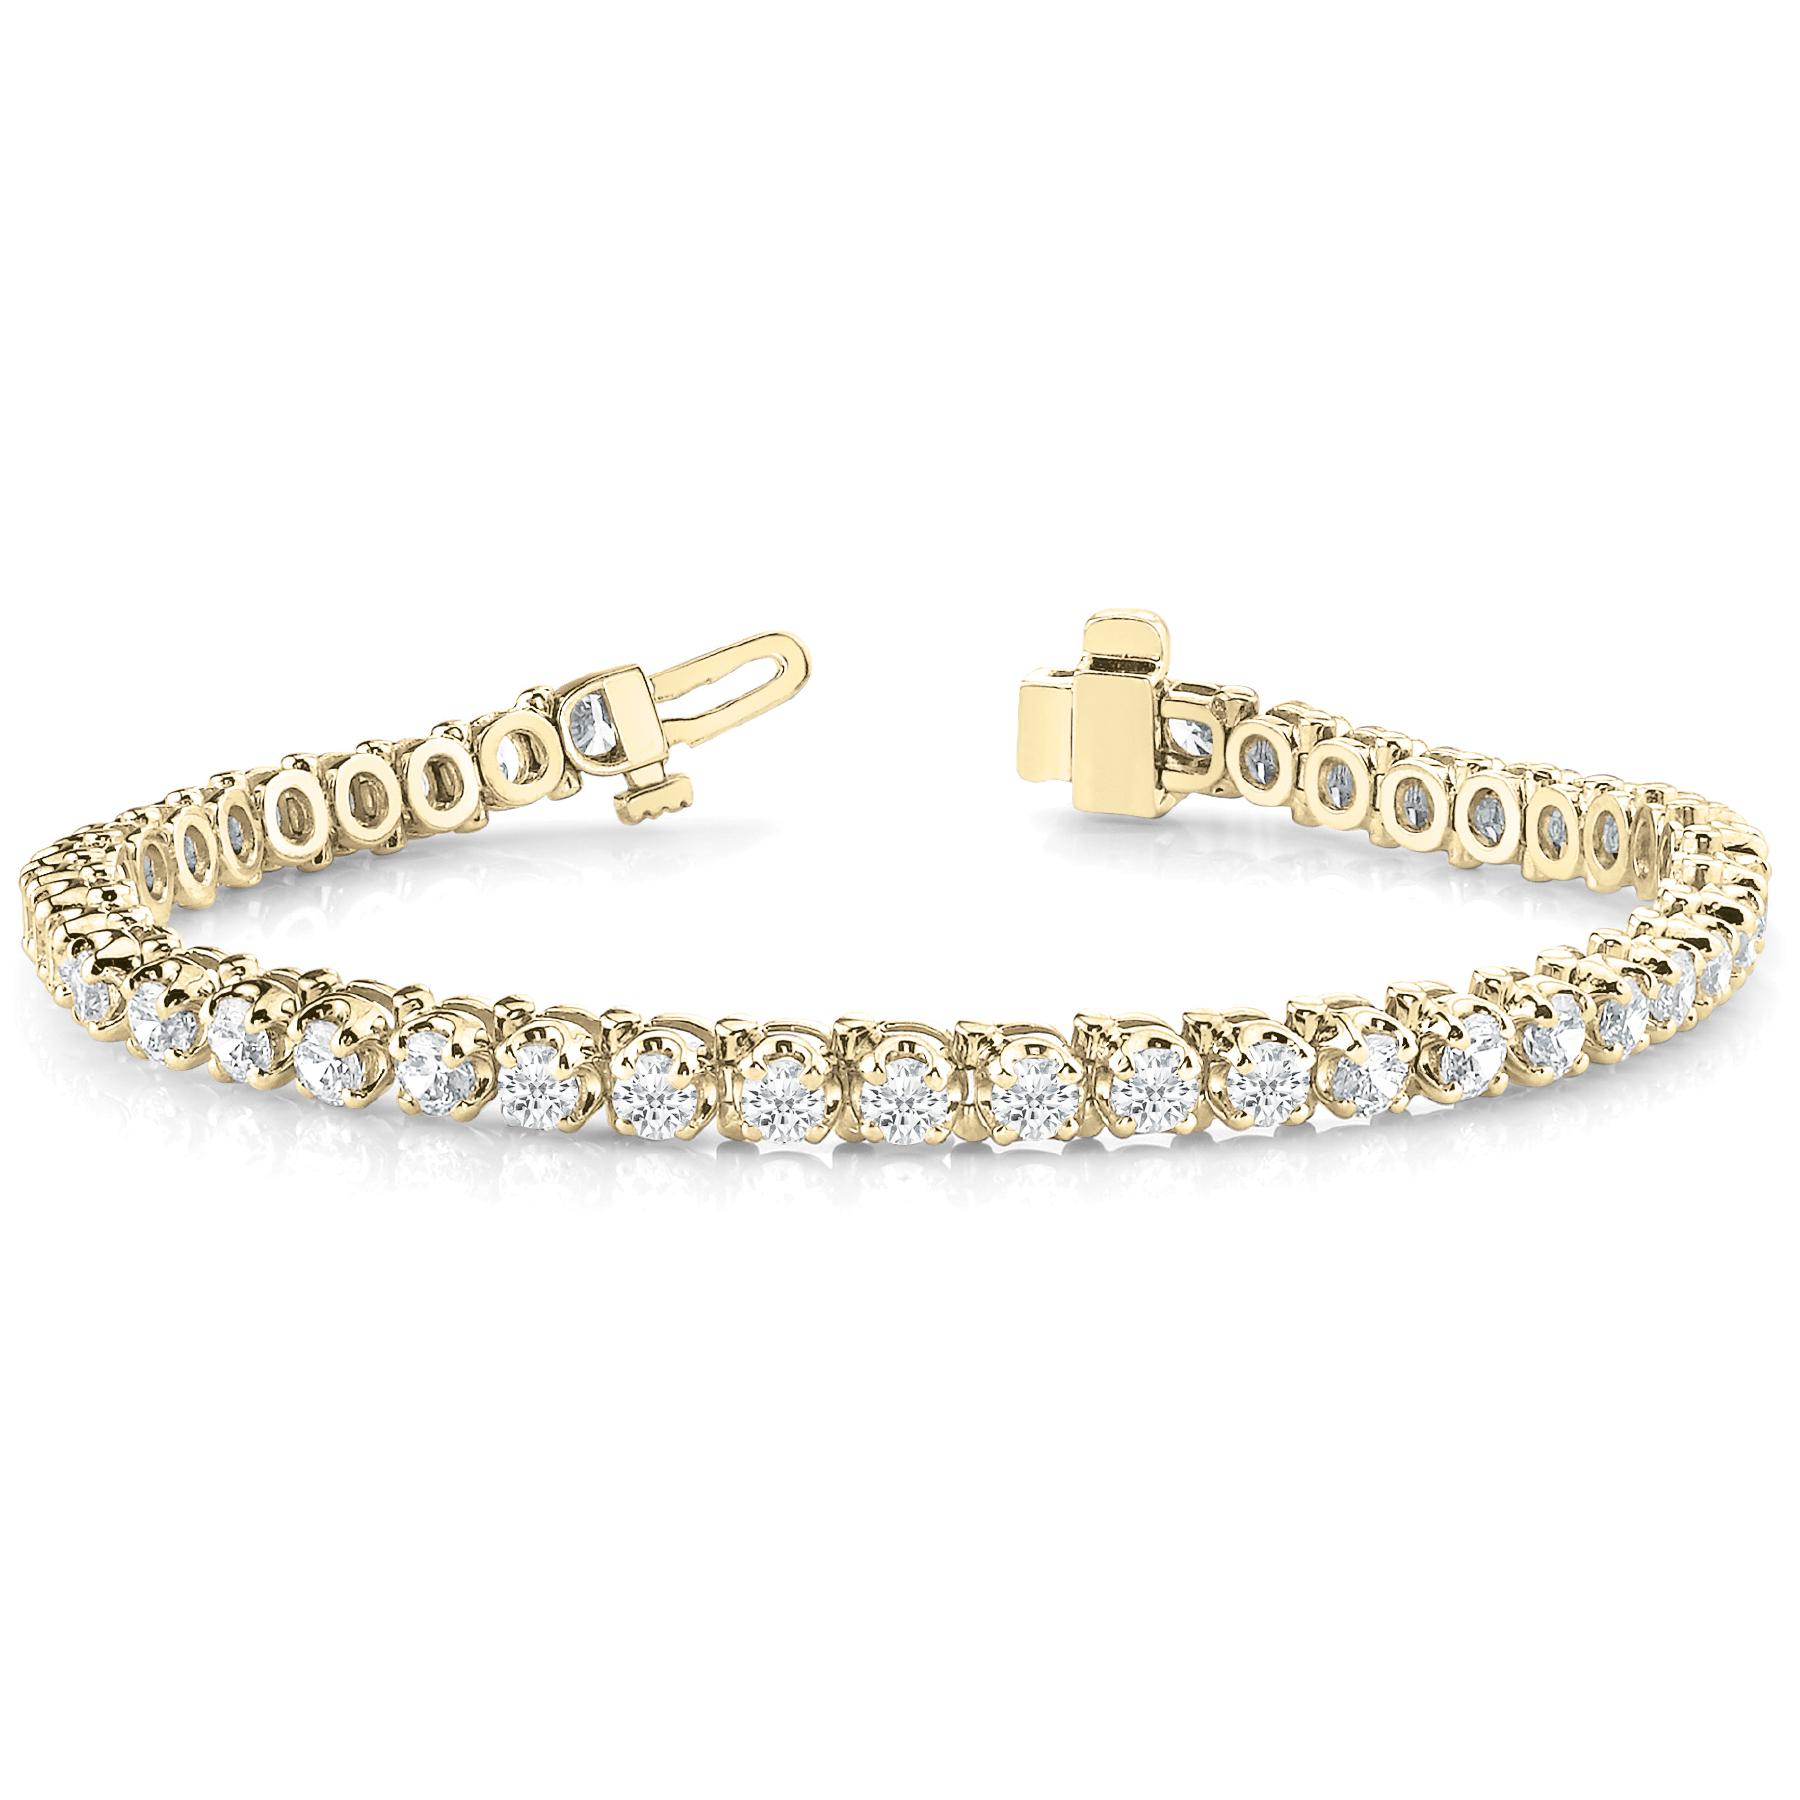 18k-yellow-gold-prong-set-tennis-diamond-bracelet-4488-04-05